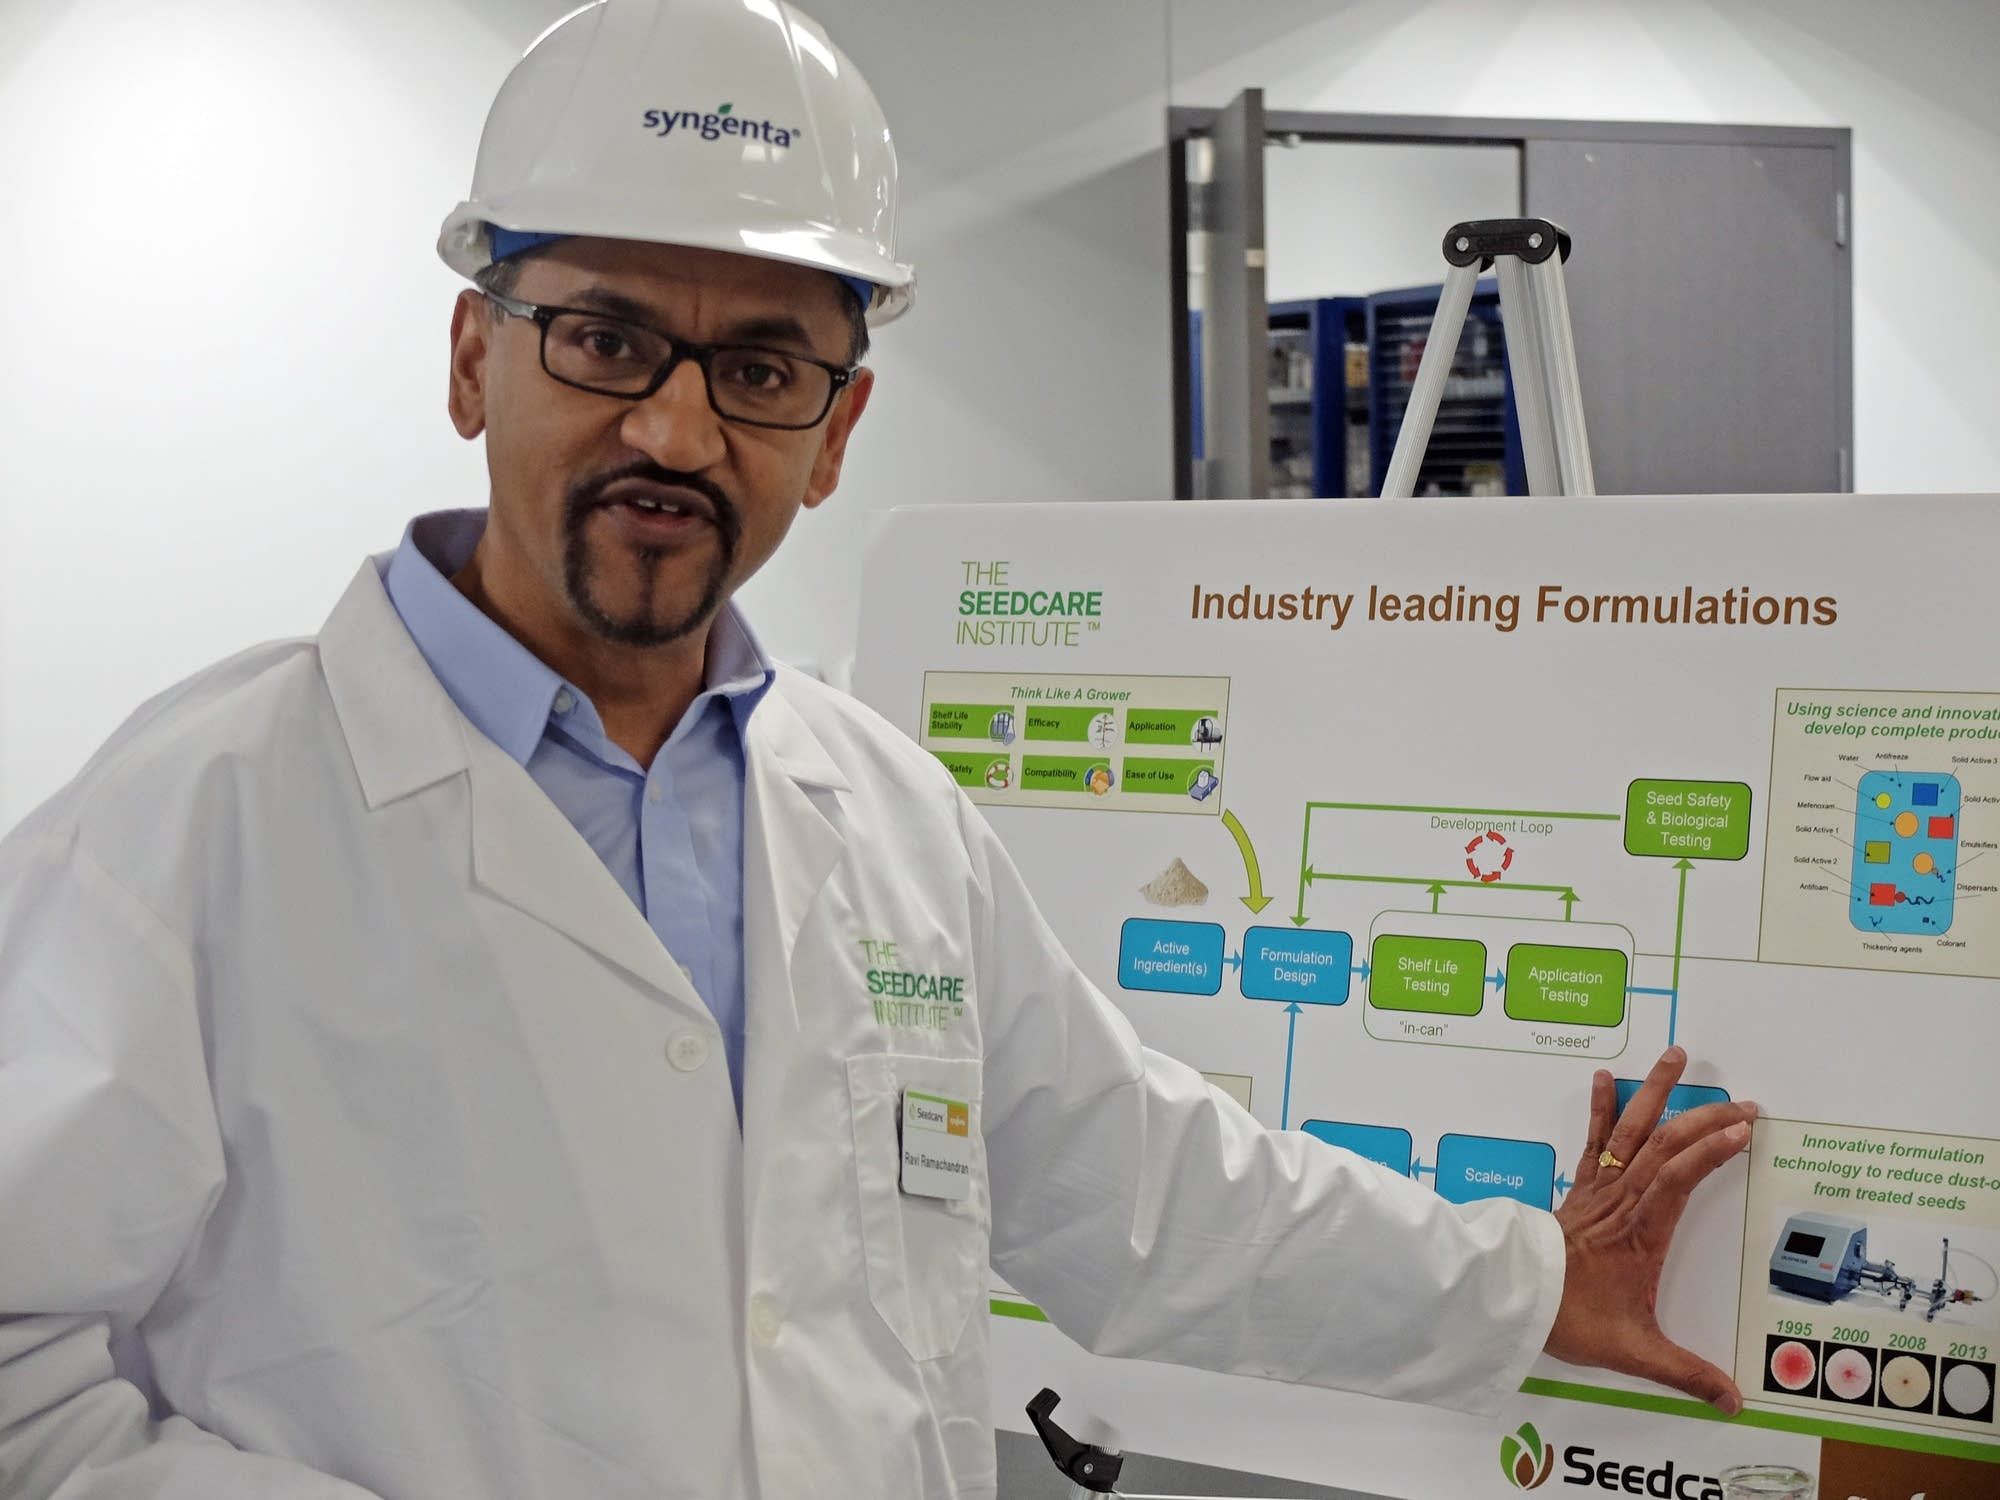 The head of the Syngenta Seedcare Institute, Ravi Ramachandran